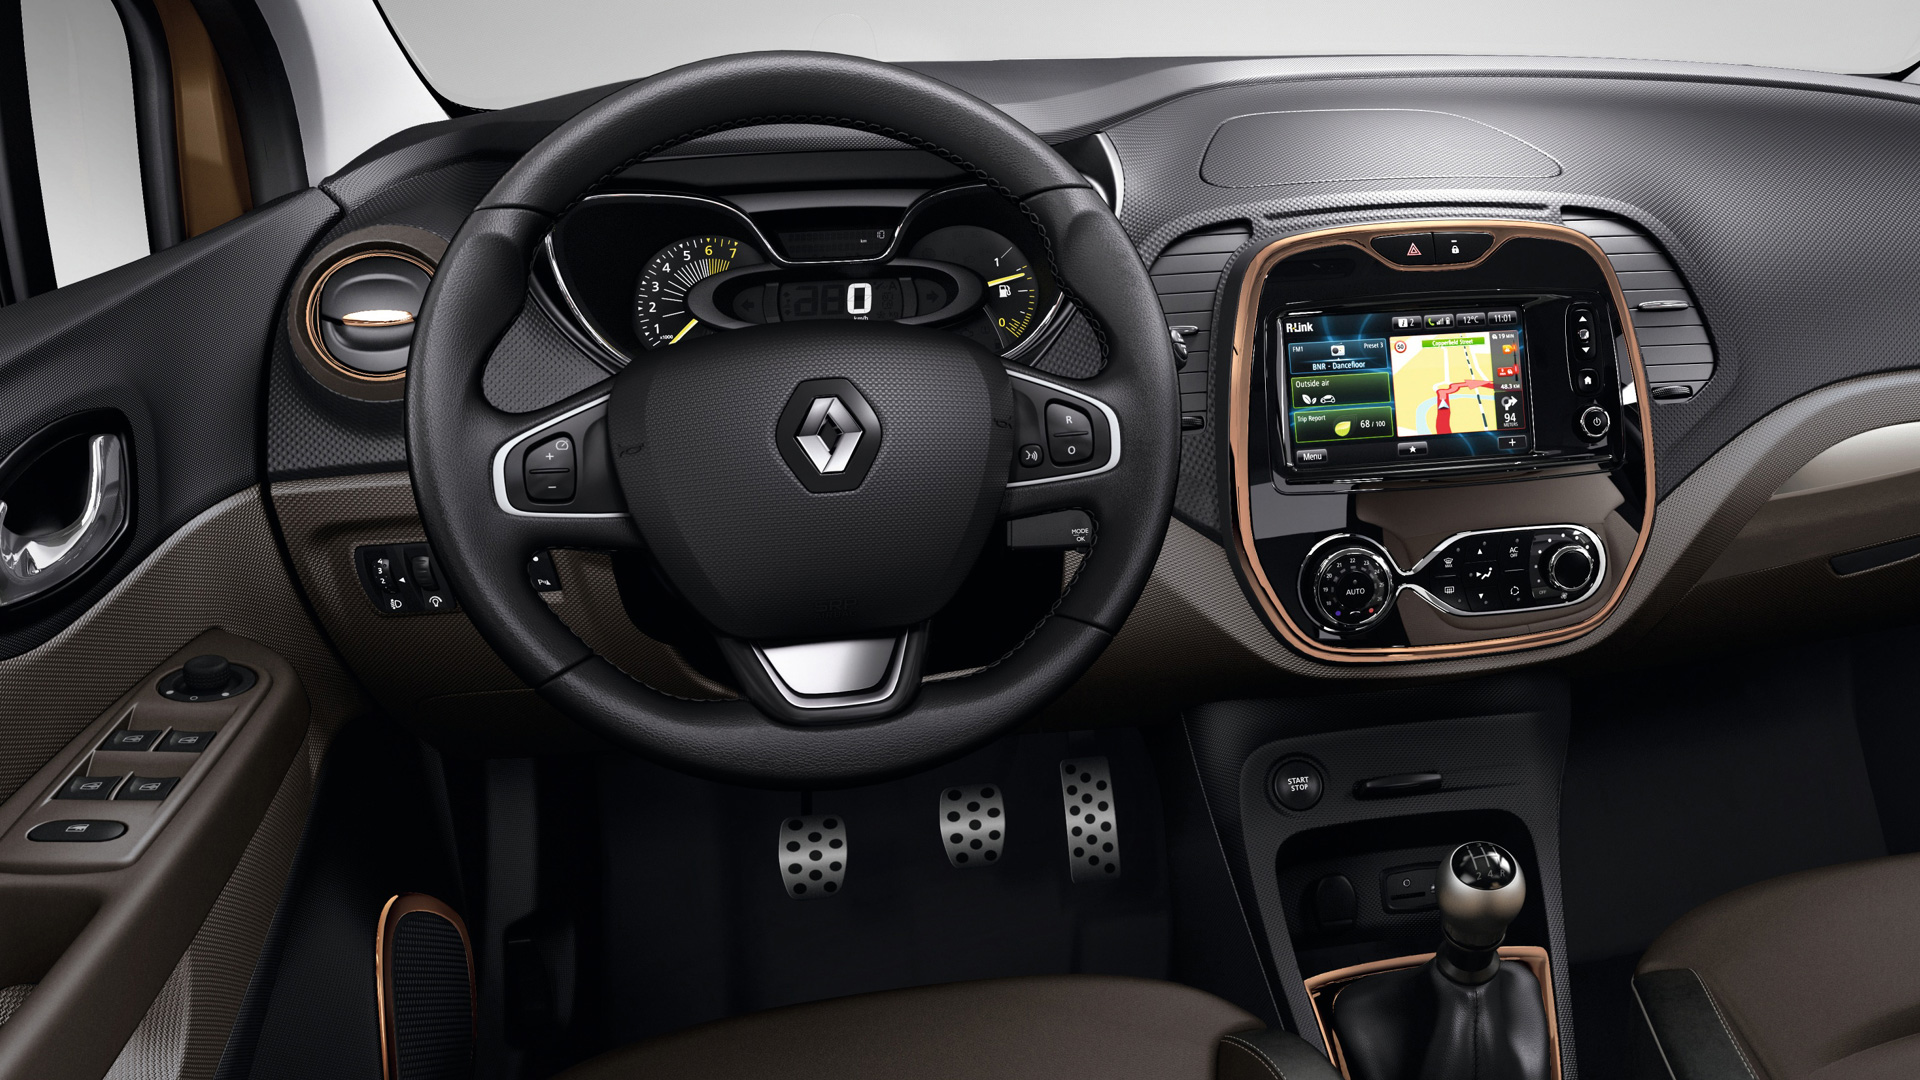 Renault captur sl premium llega el alto de gama for Interior renault captur